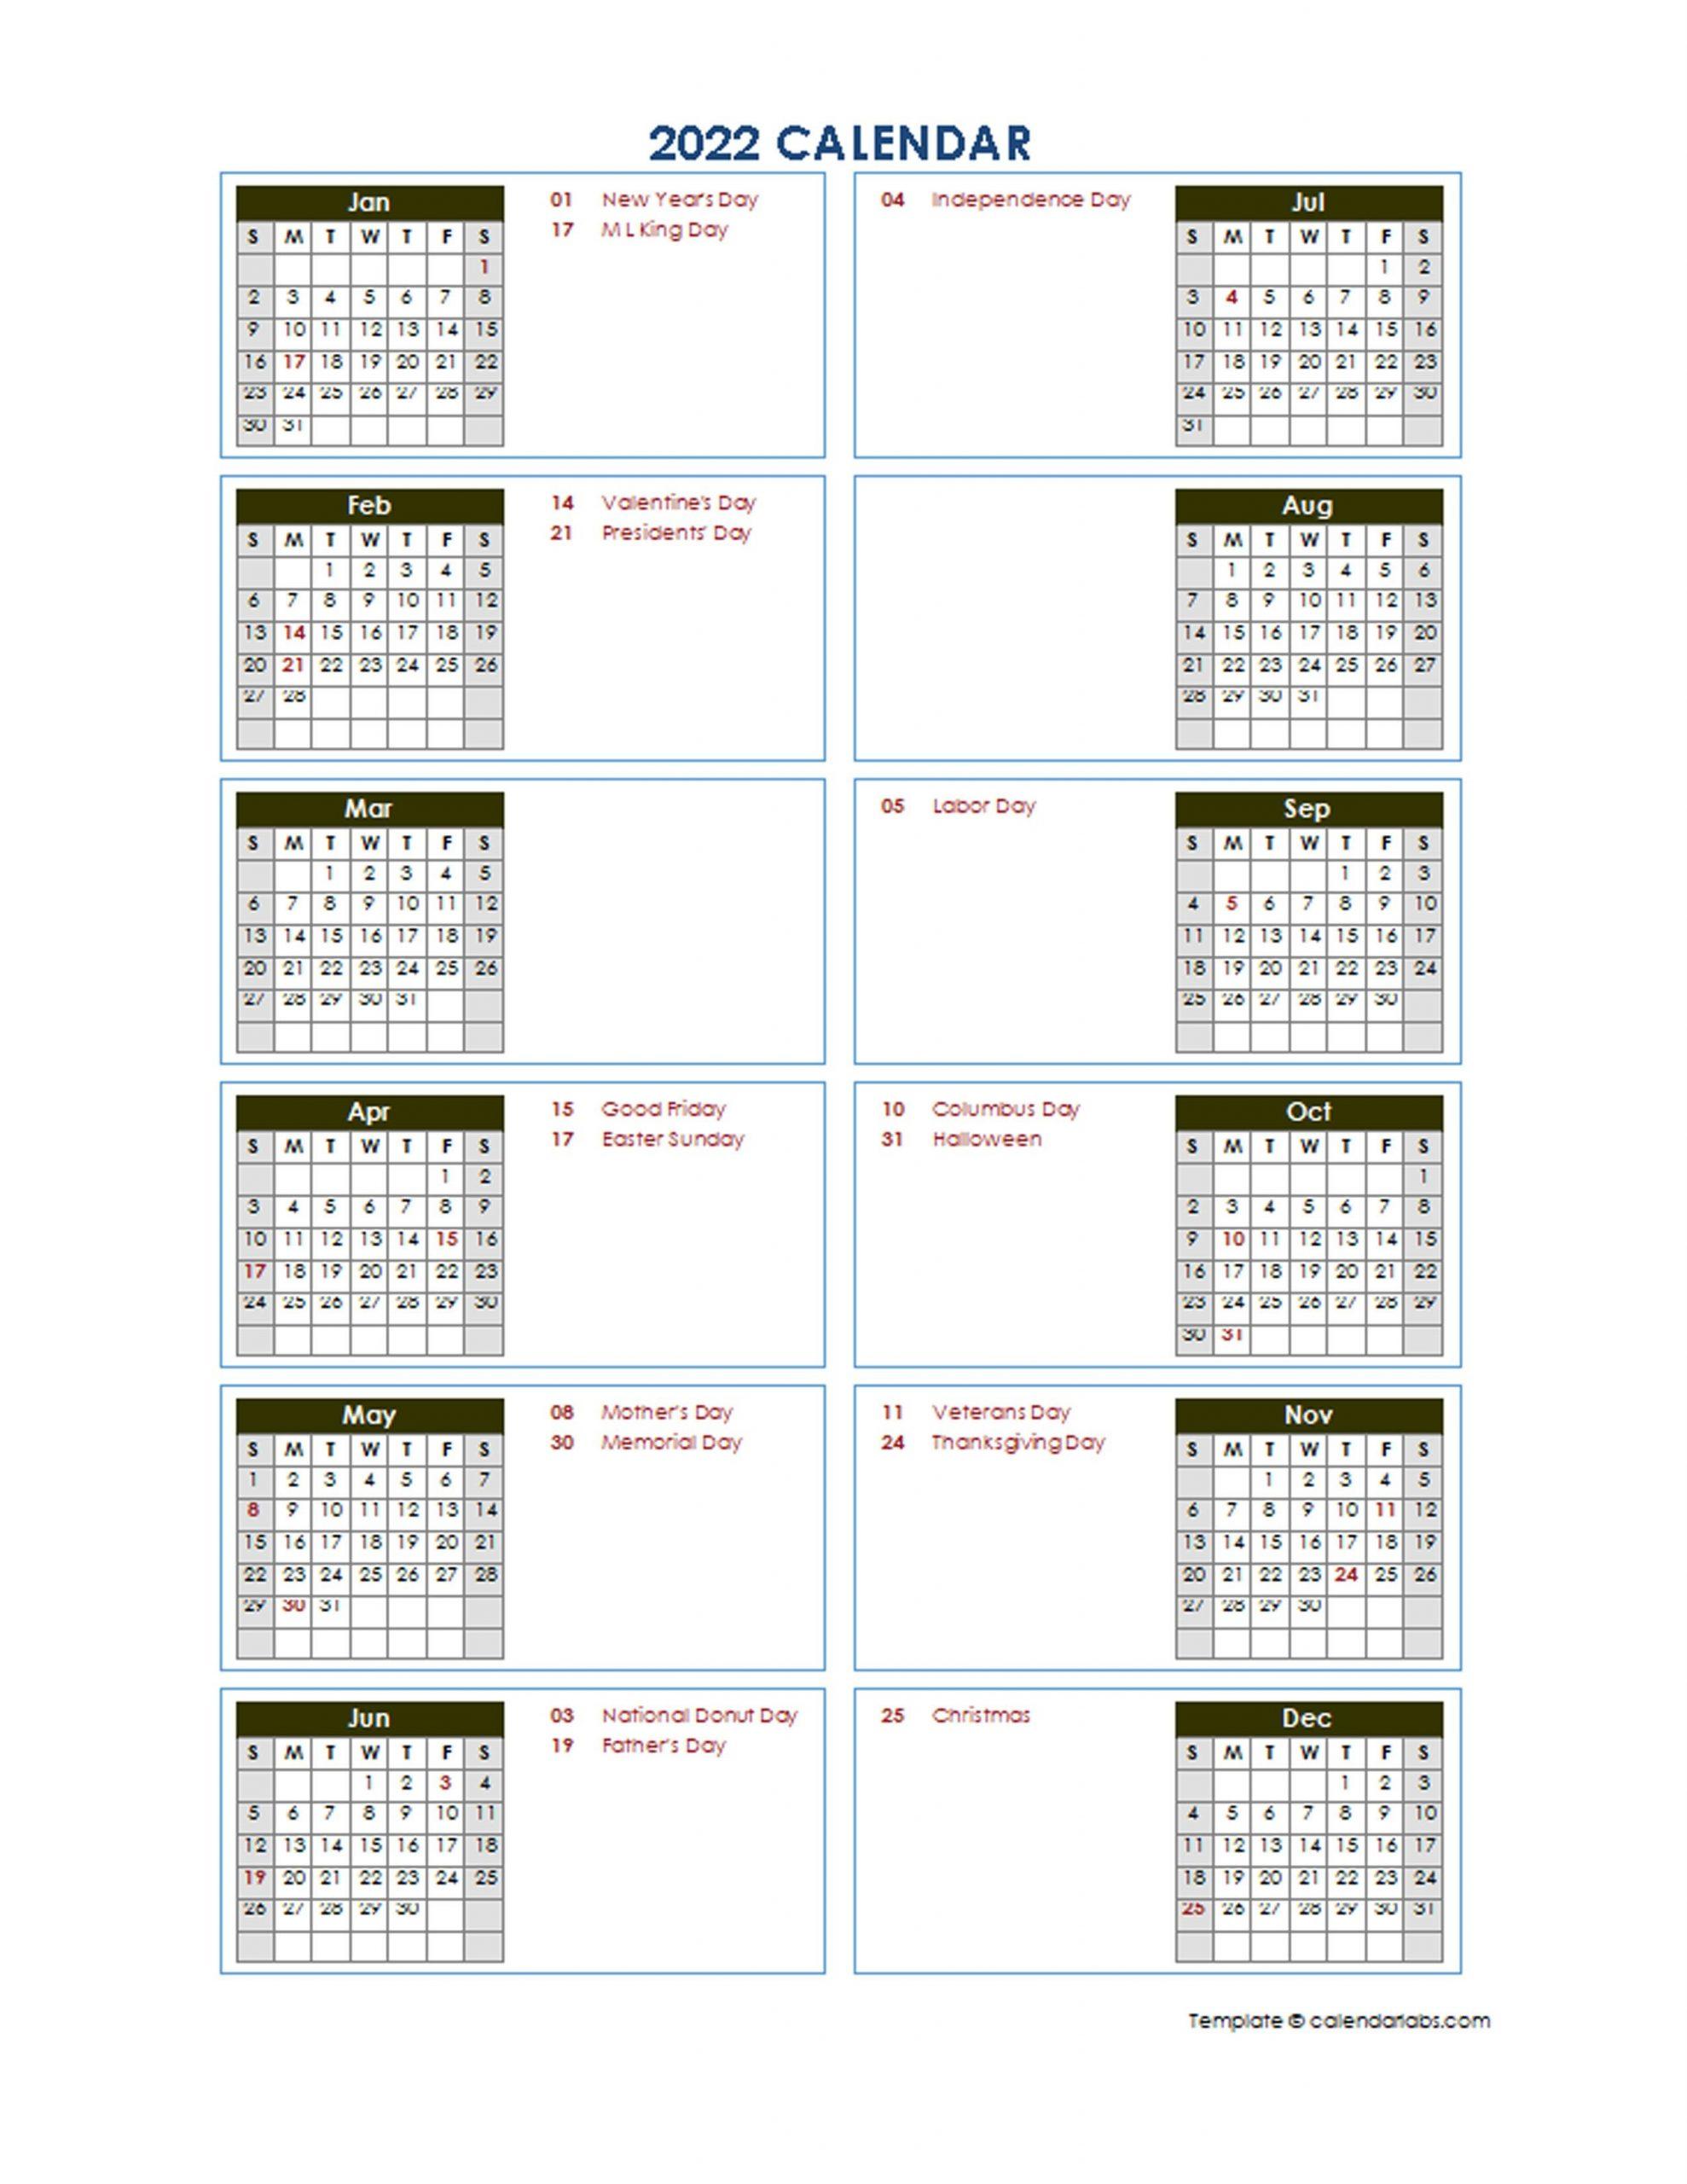 2022 Yearly Calendar Template Vertical Design - Free